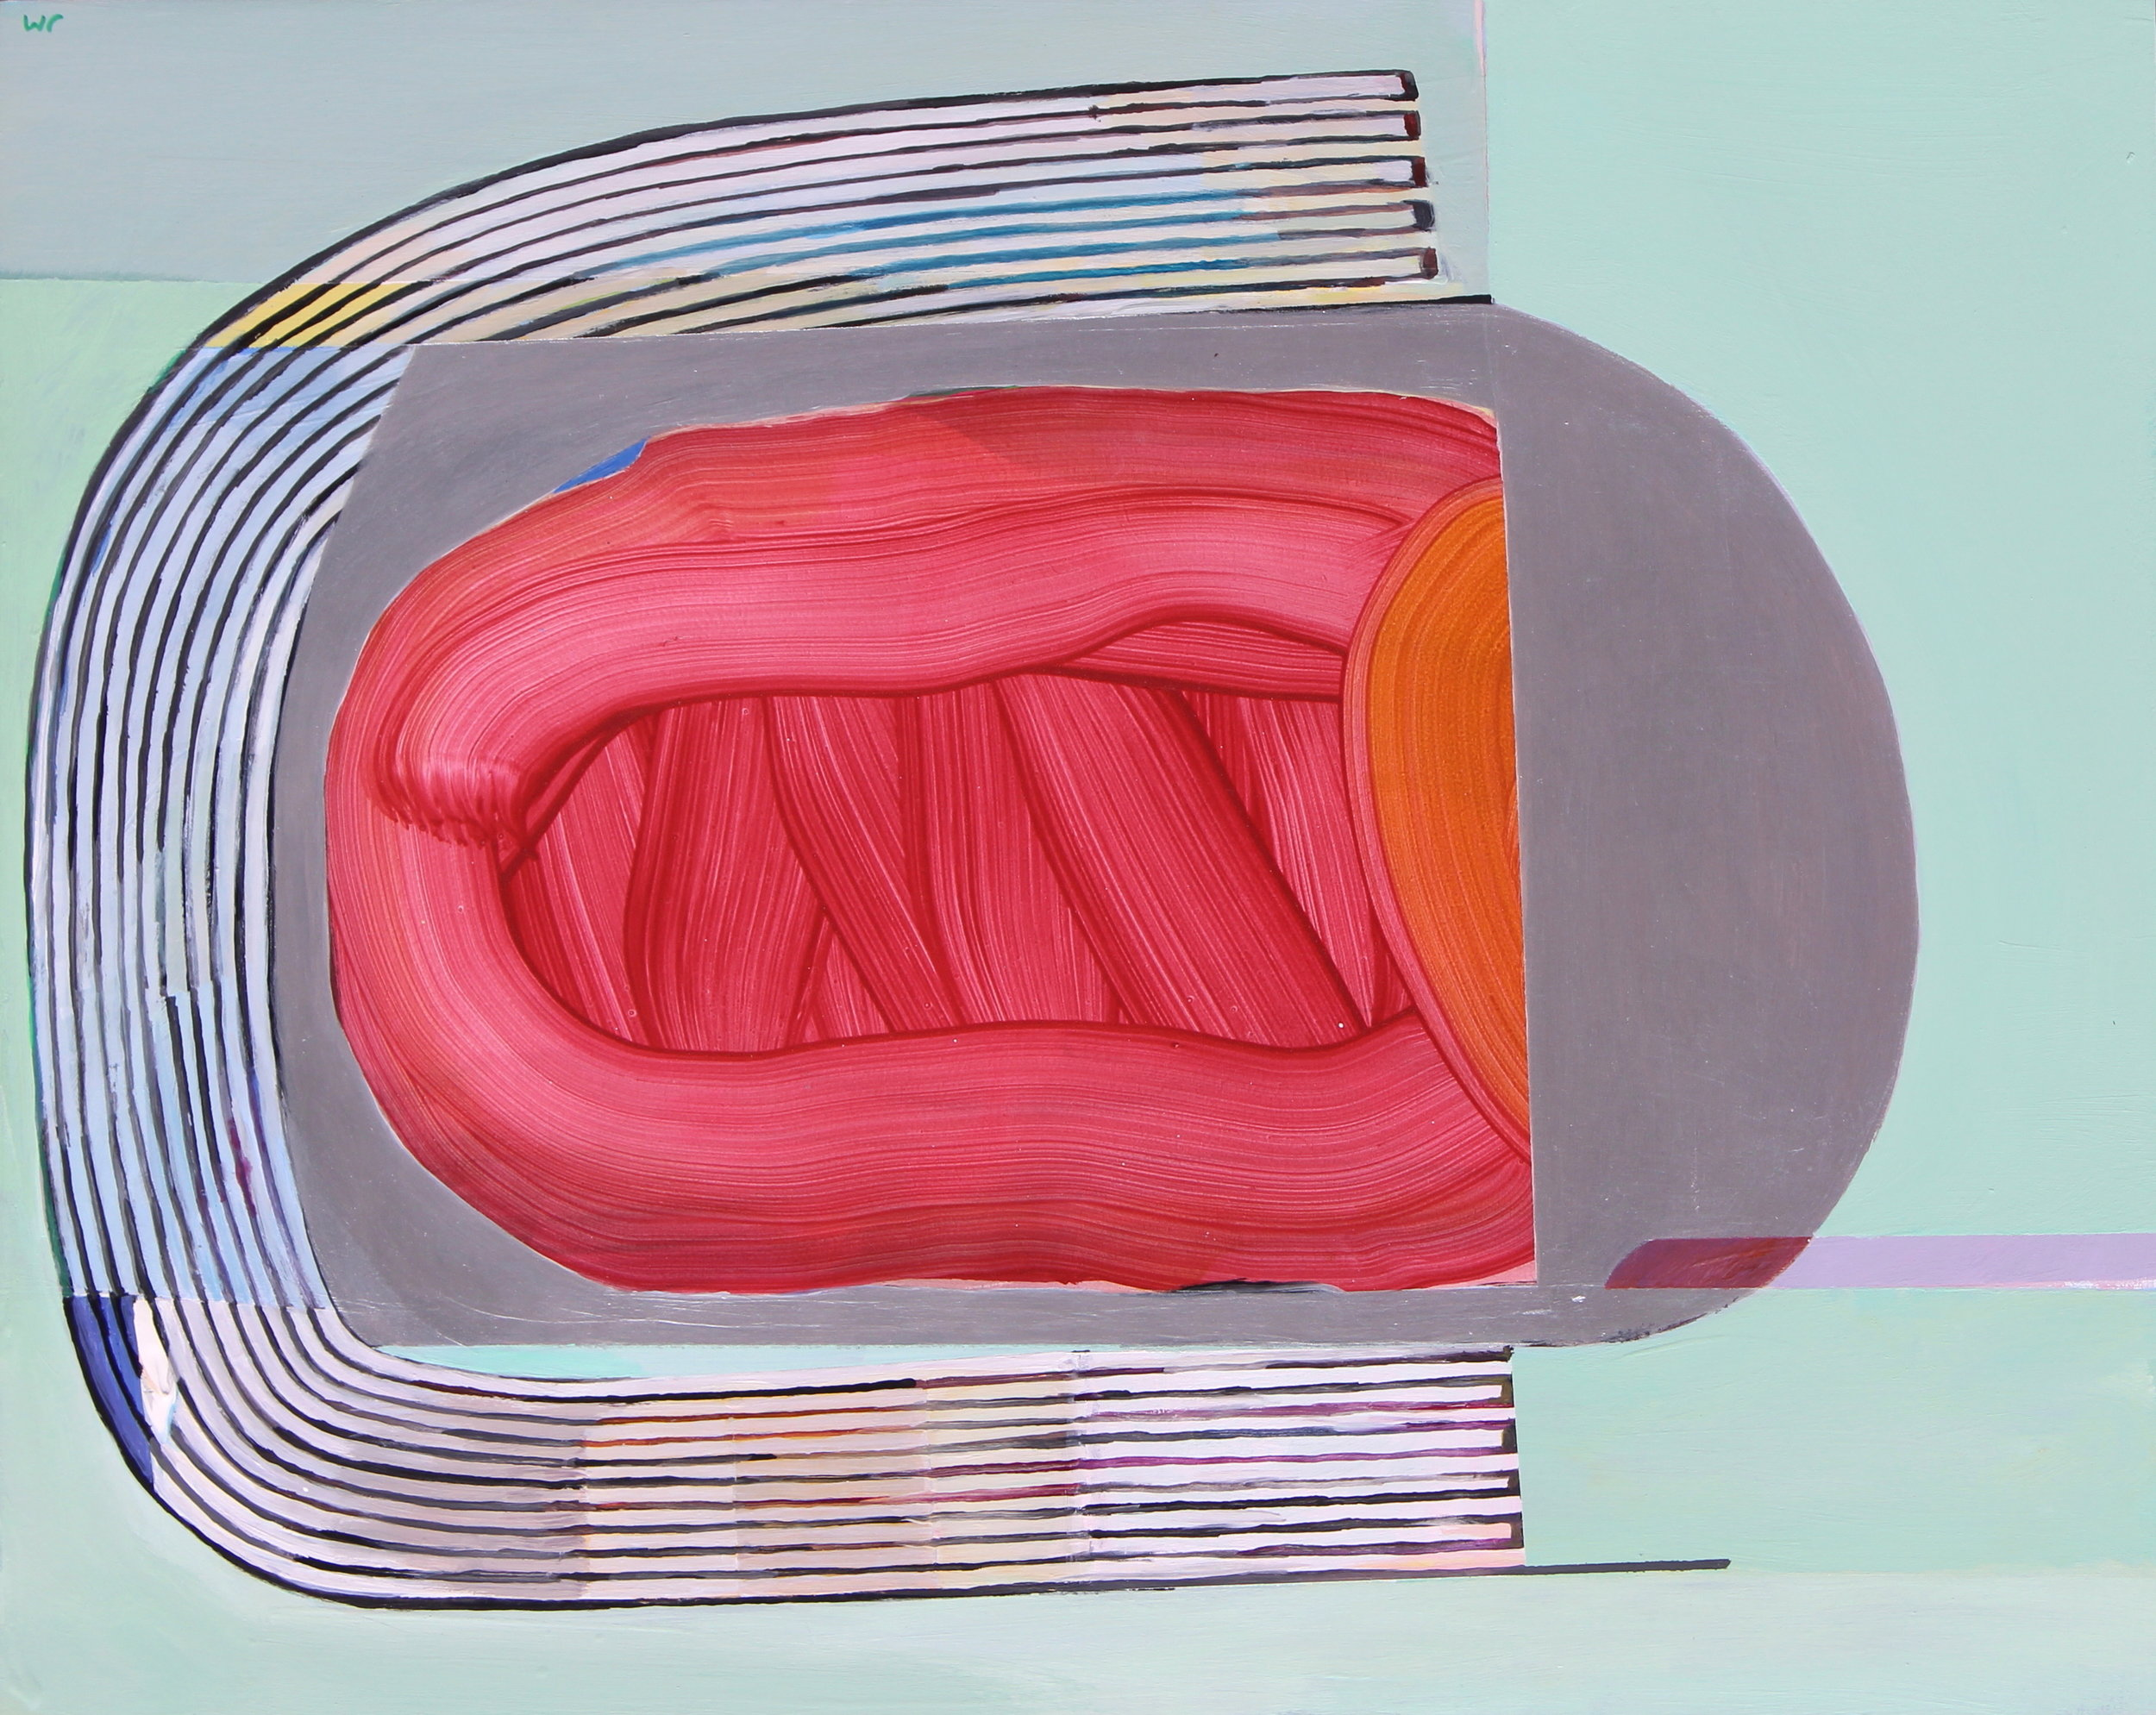 Joel Moskowitz, Soft Underbelly, Acrylic on wood panel, 16x20